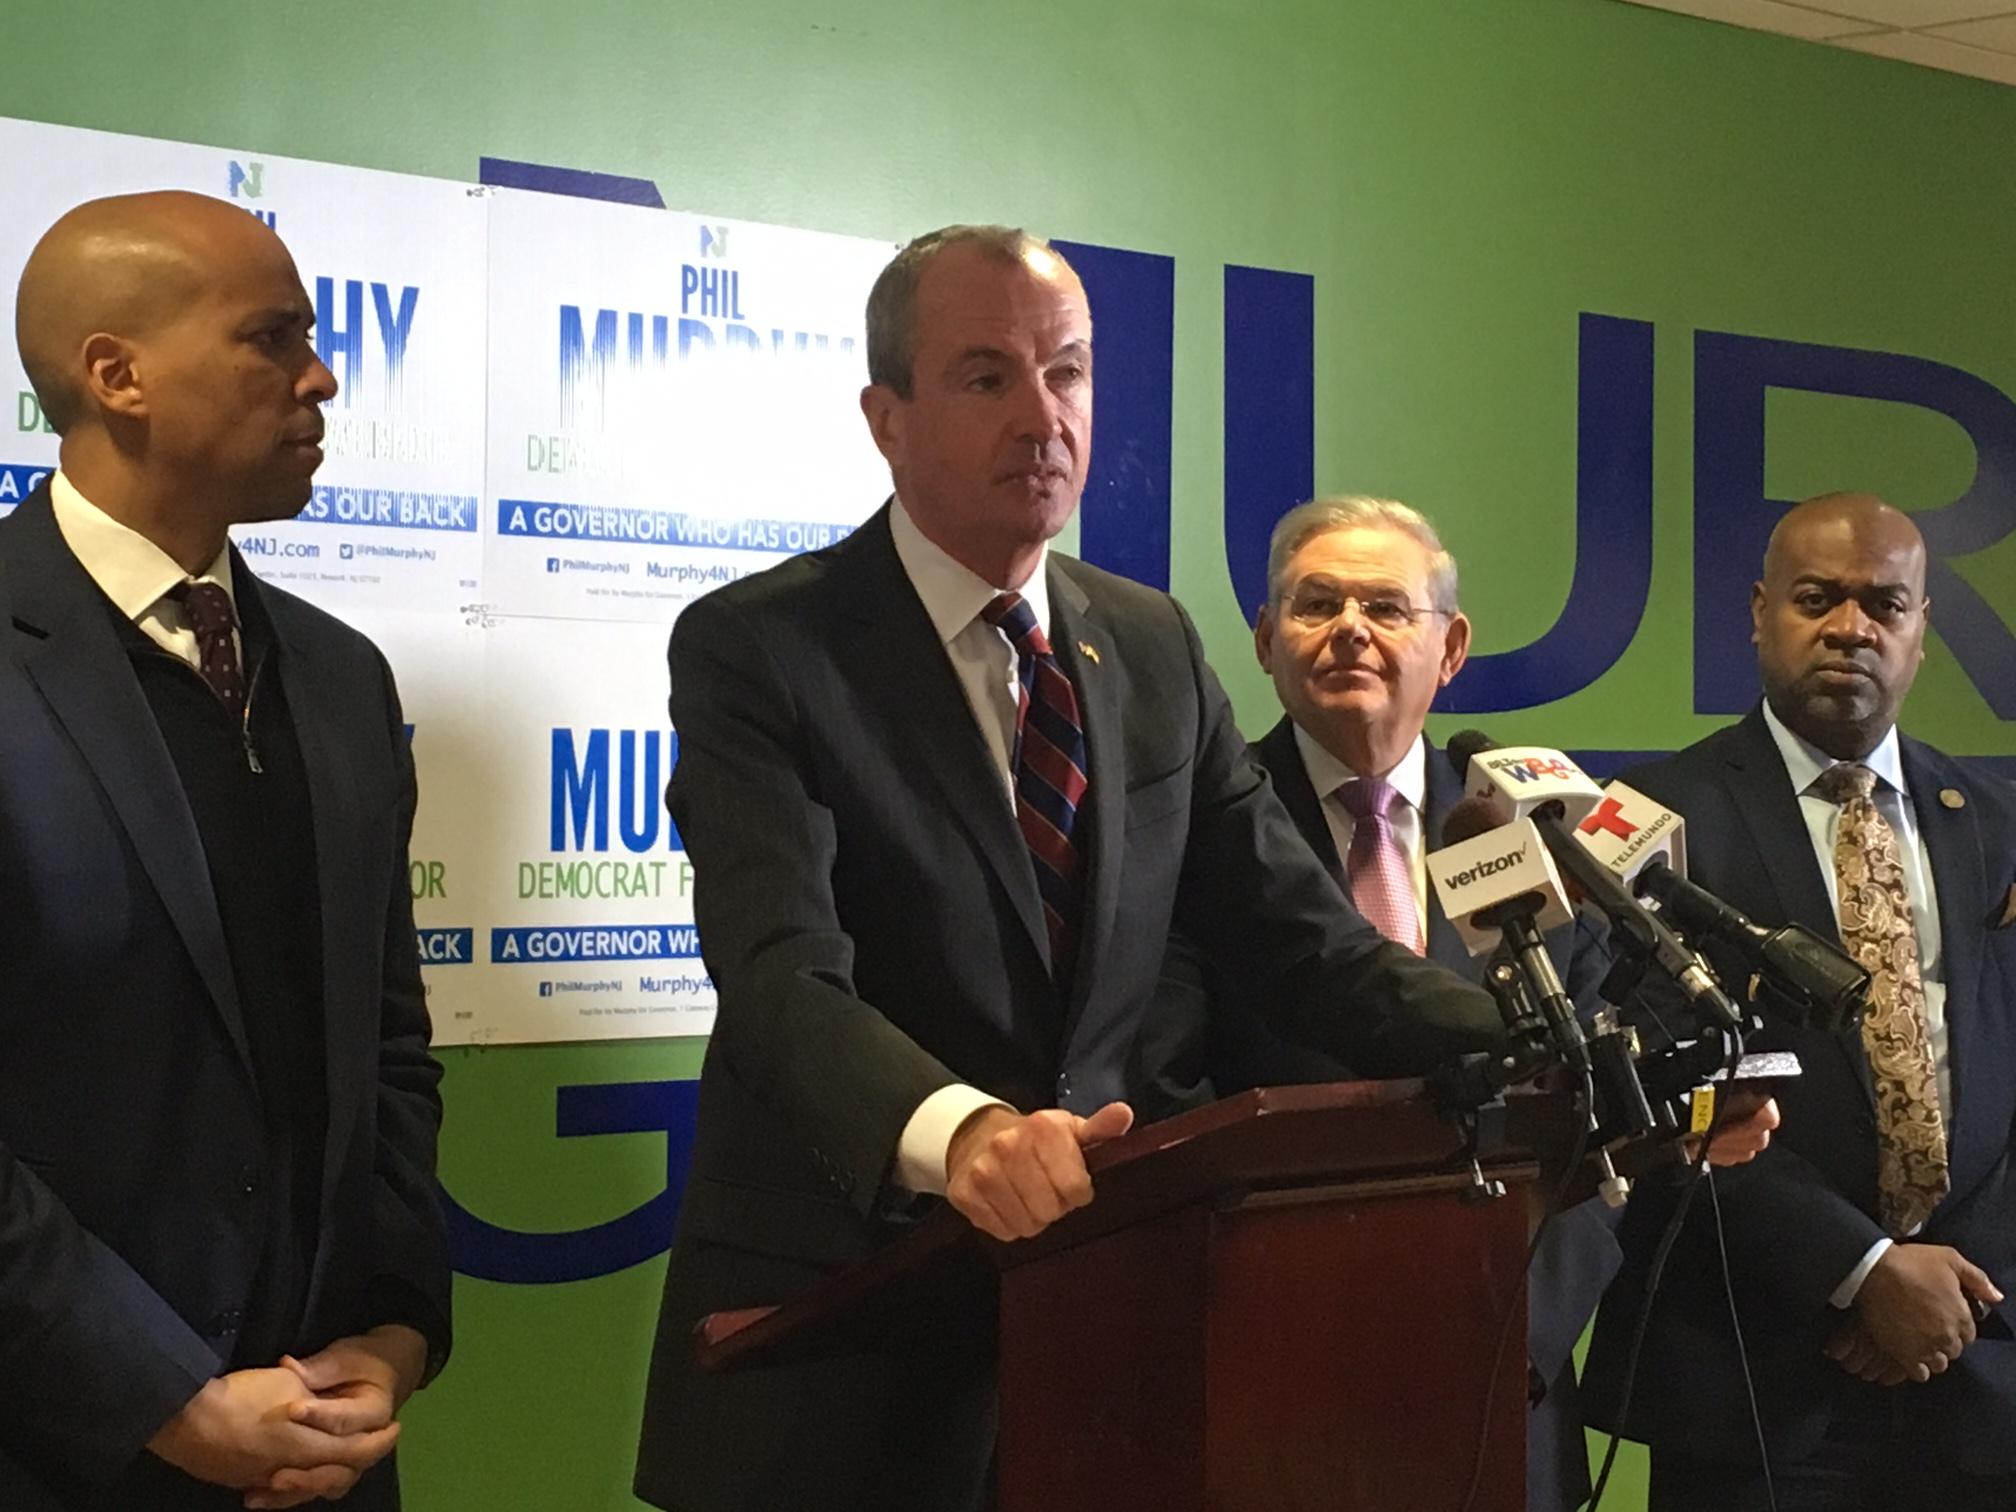 From left: Senator Cory Booker, gubernatorial candidate Phil Murphy, Sentor Bob Menendez and Newark Mayor Ras Baraka.